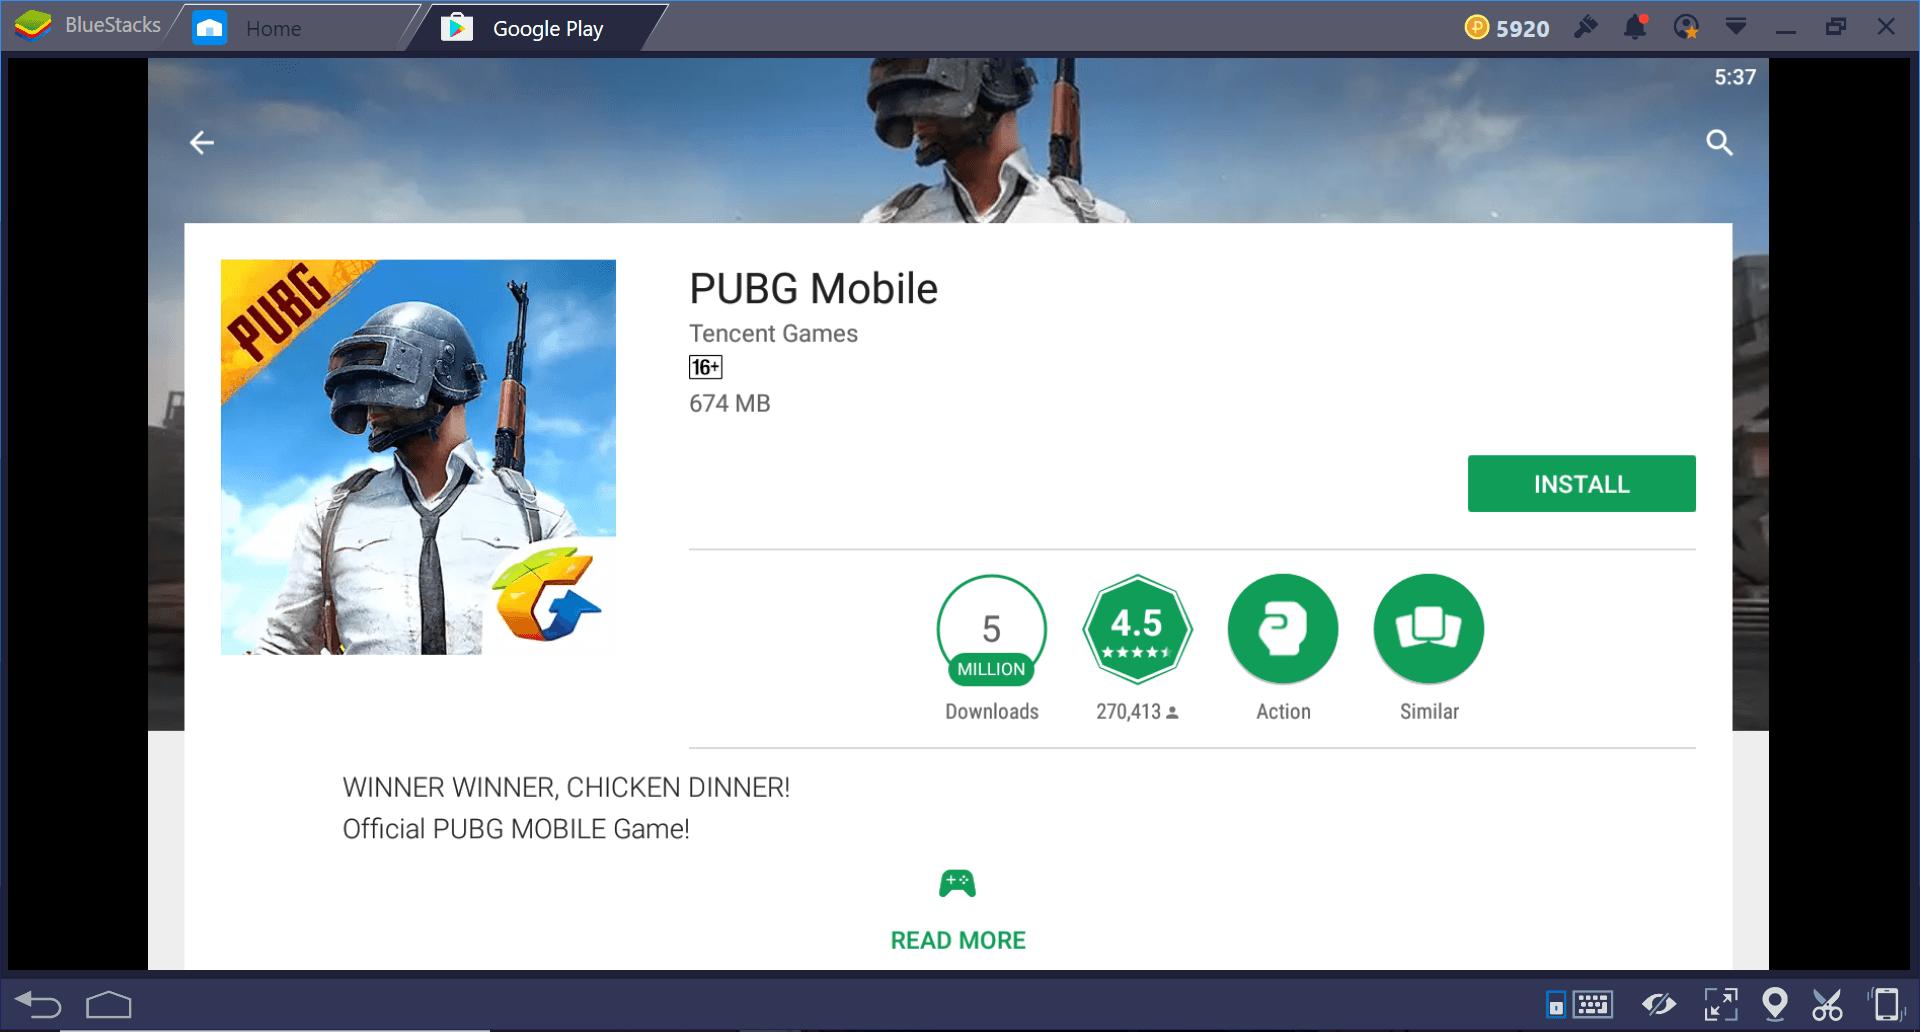 PUBG Mobile เวอร์ชั่นภาษาอังกฤษเปิดให้บริการแล้ว